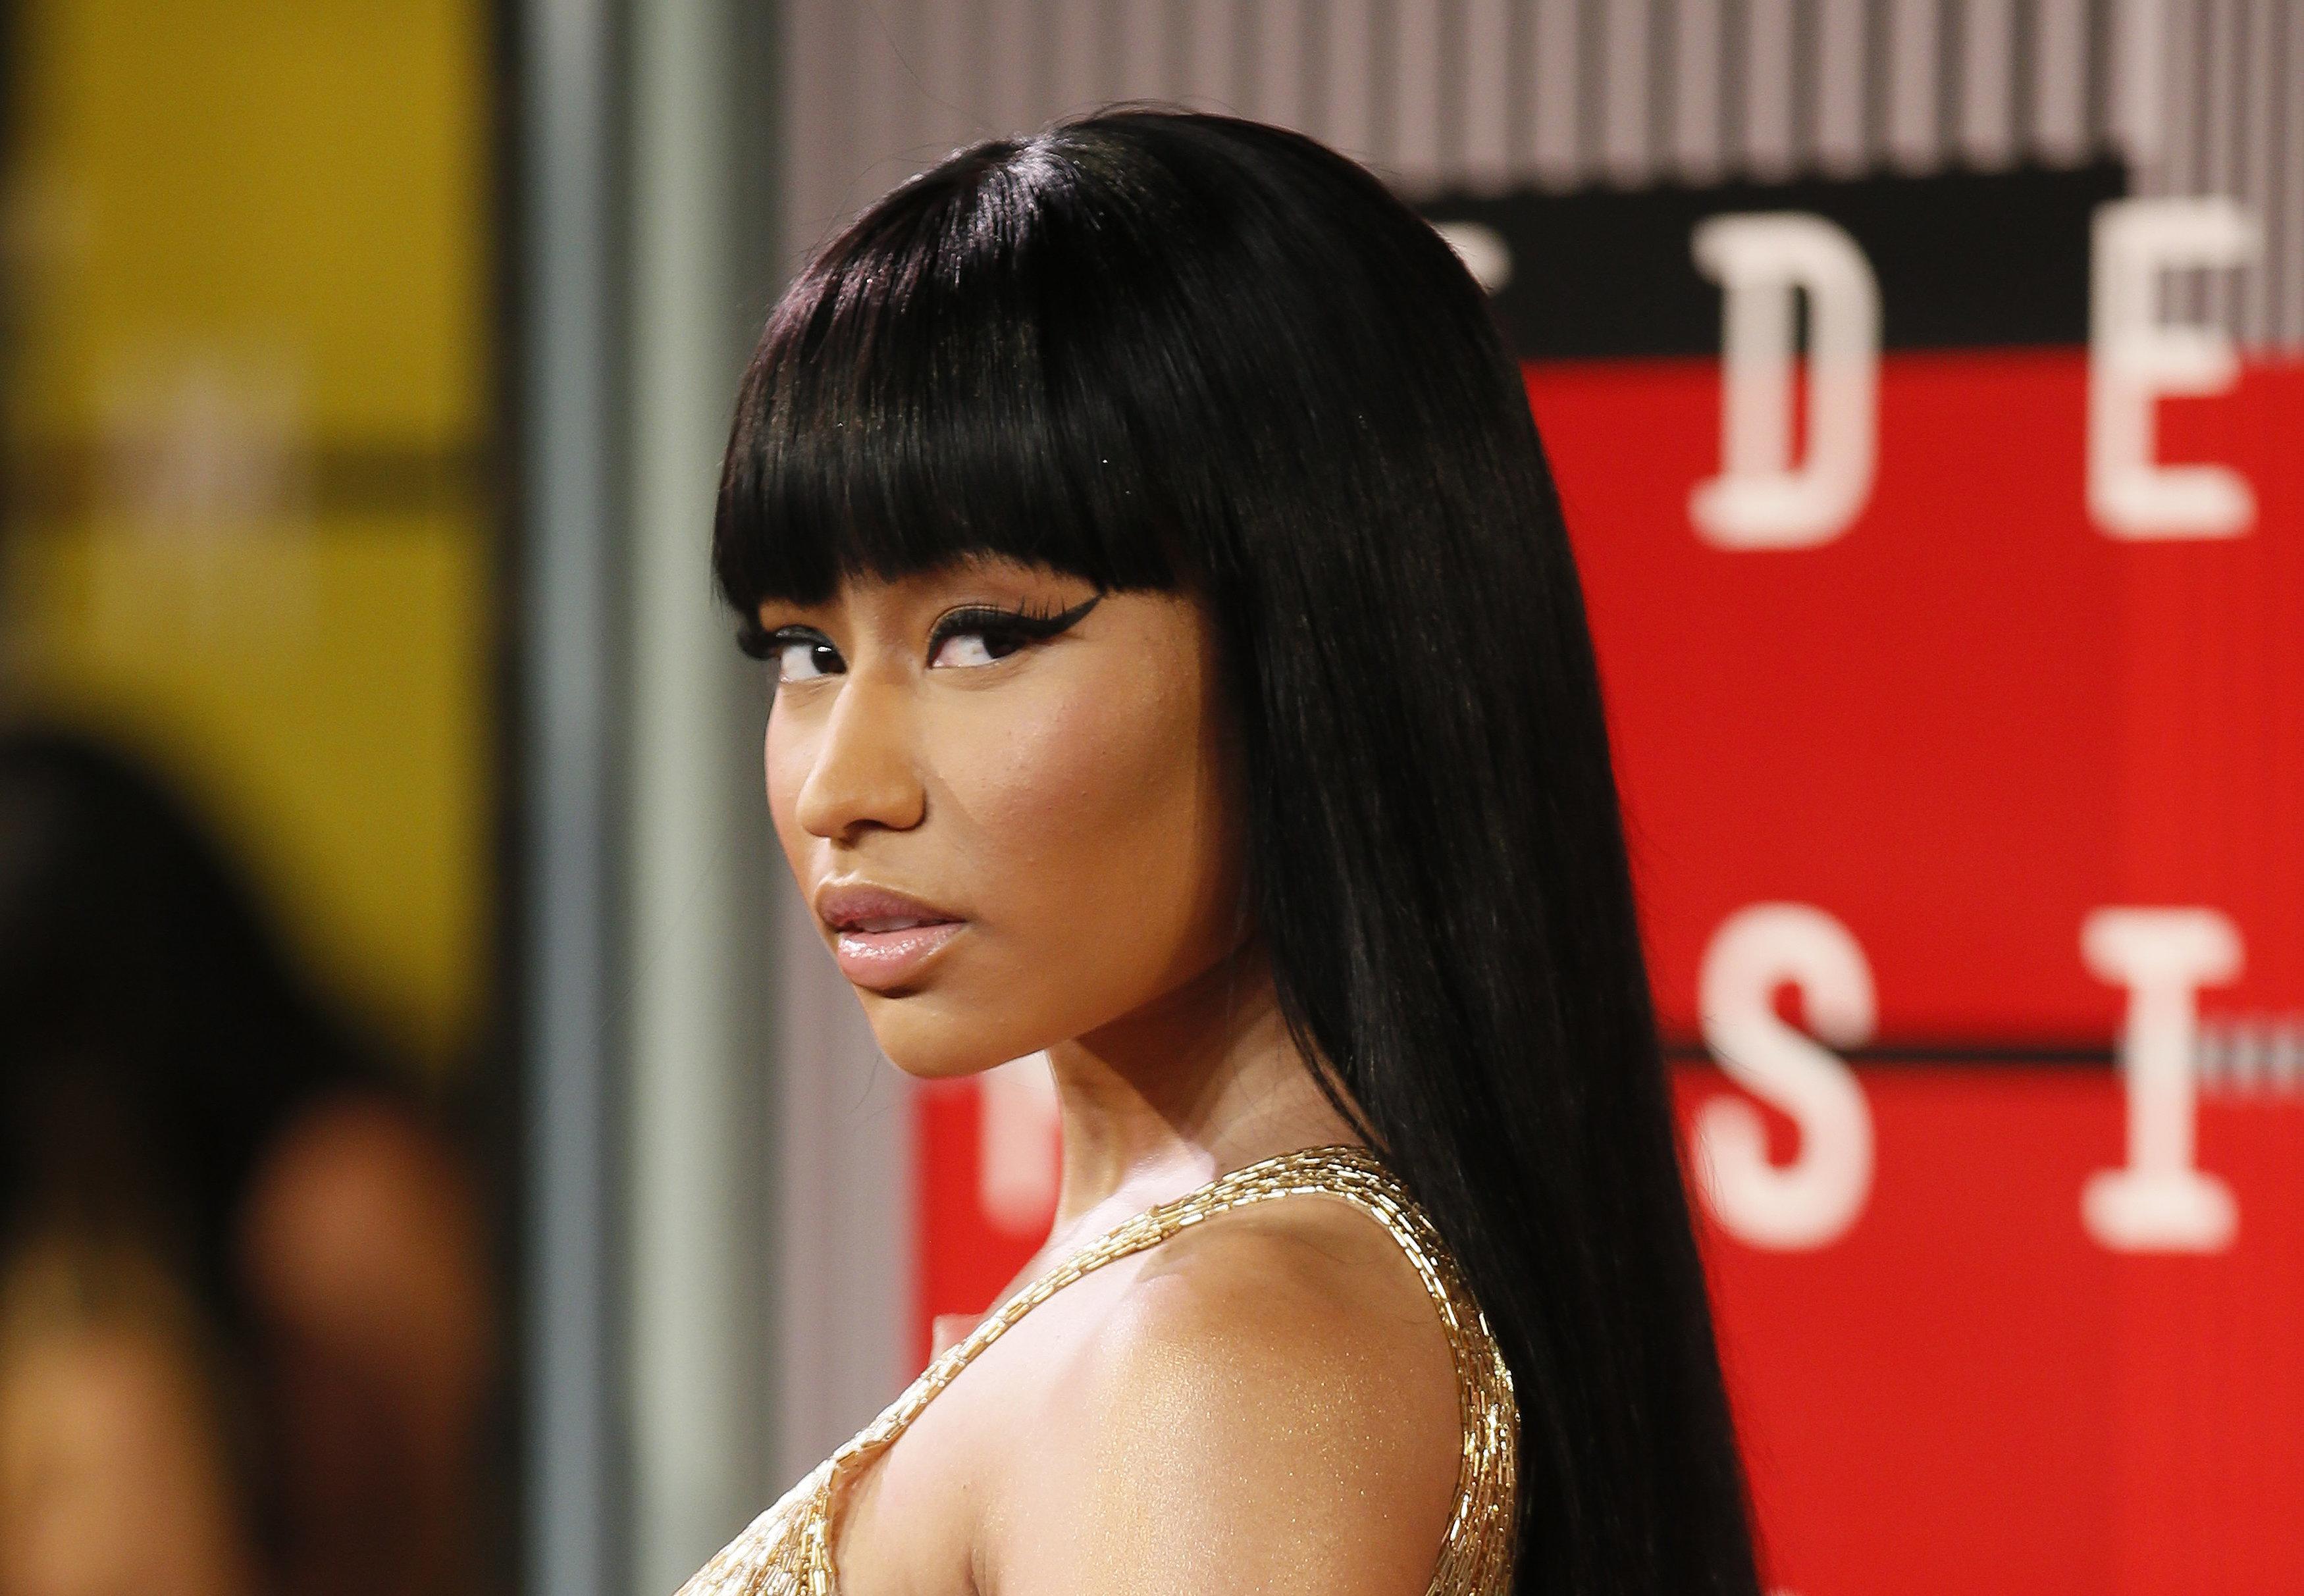 Recording artist Nicki Minaj arrives at the 2015 MTV Video Music Awards in Los Angeles, California, August 30, 2015.  REUTERS/Danny Moloshok